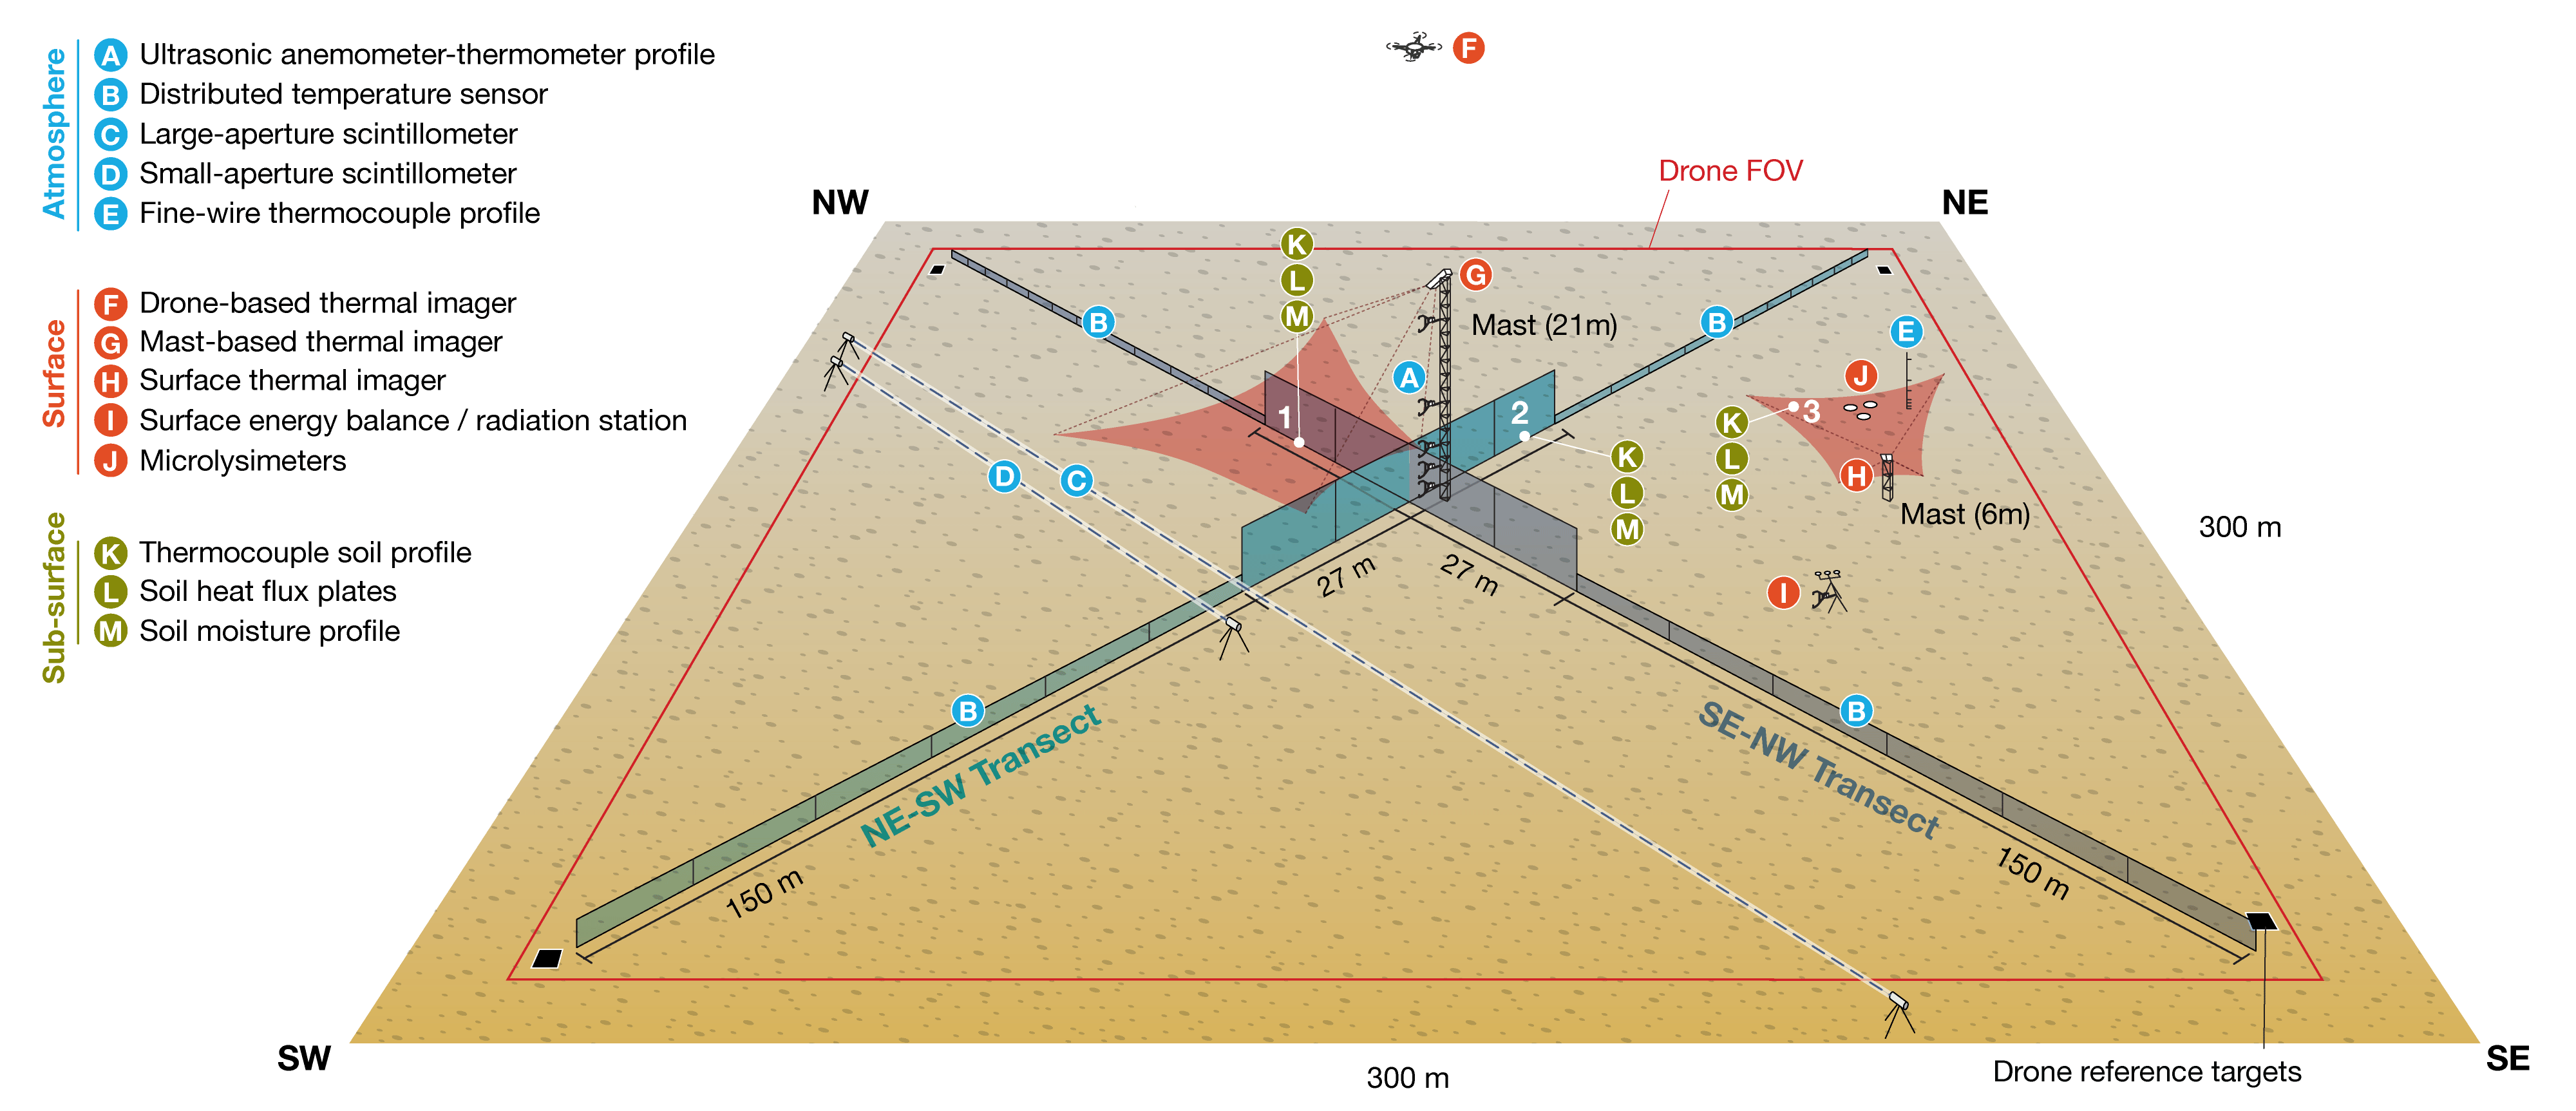 Conceptual instrumentation layout